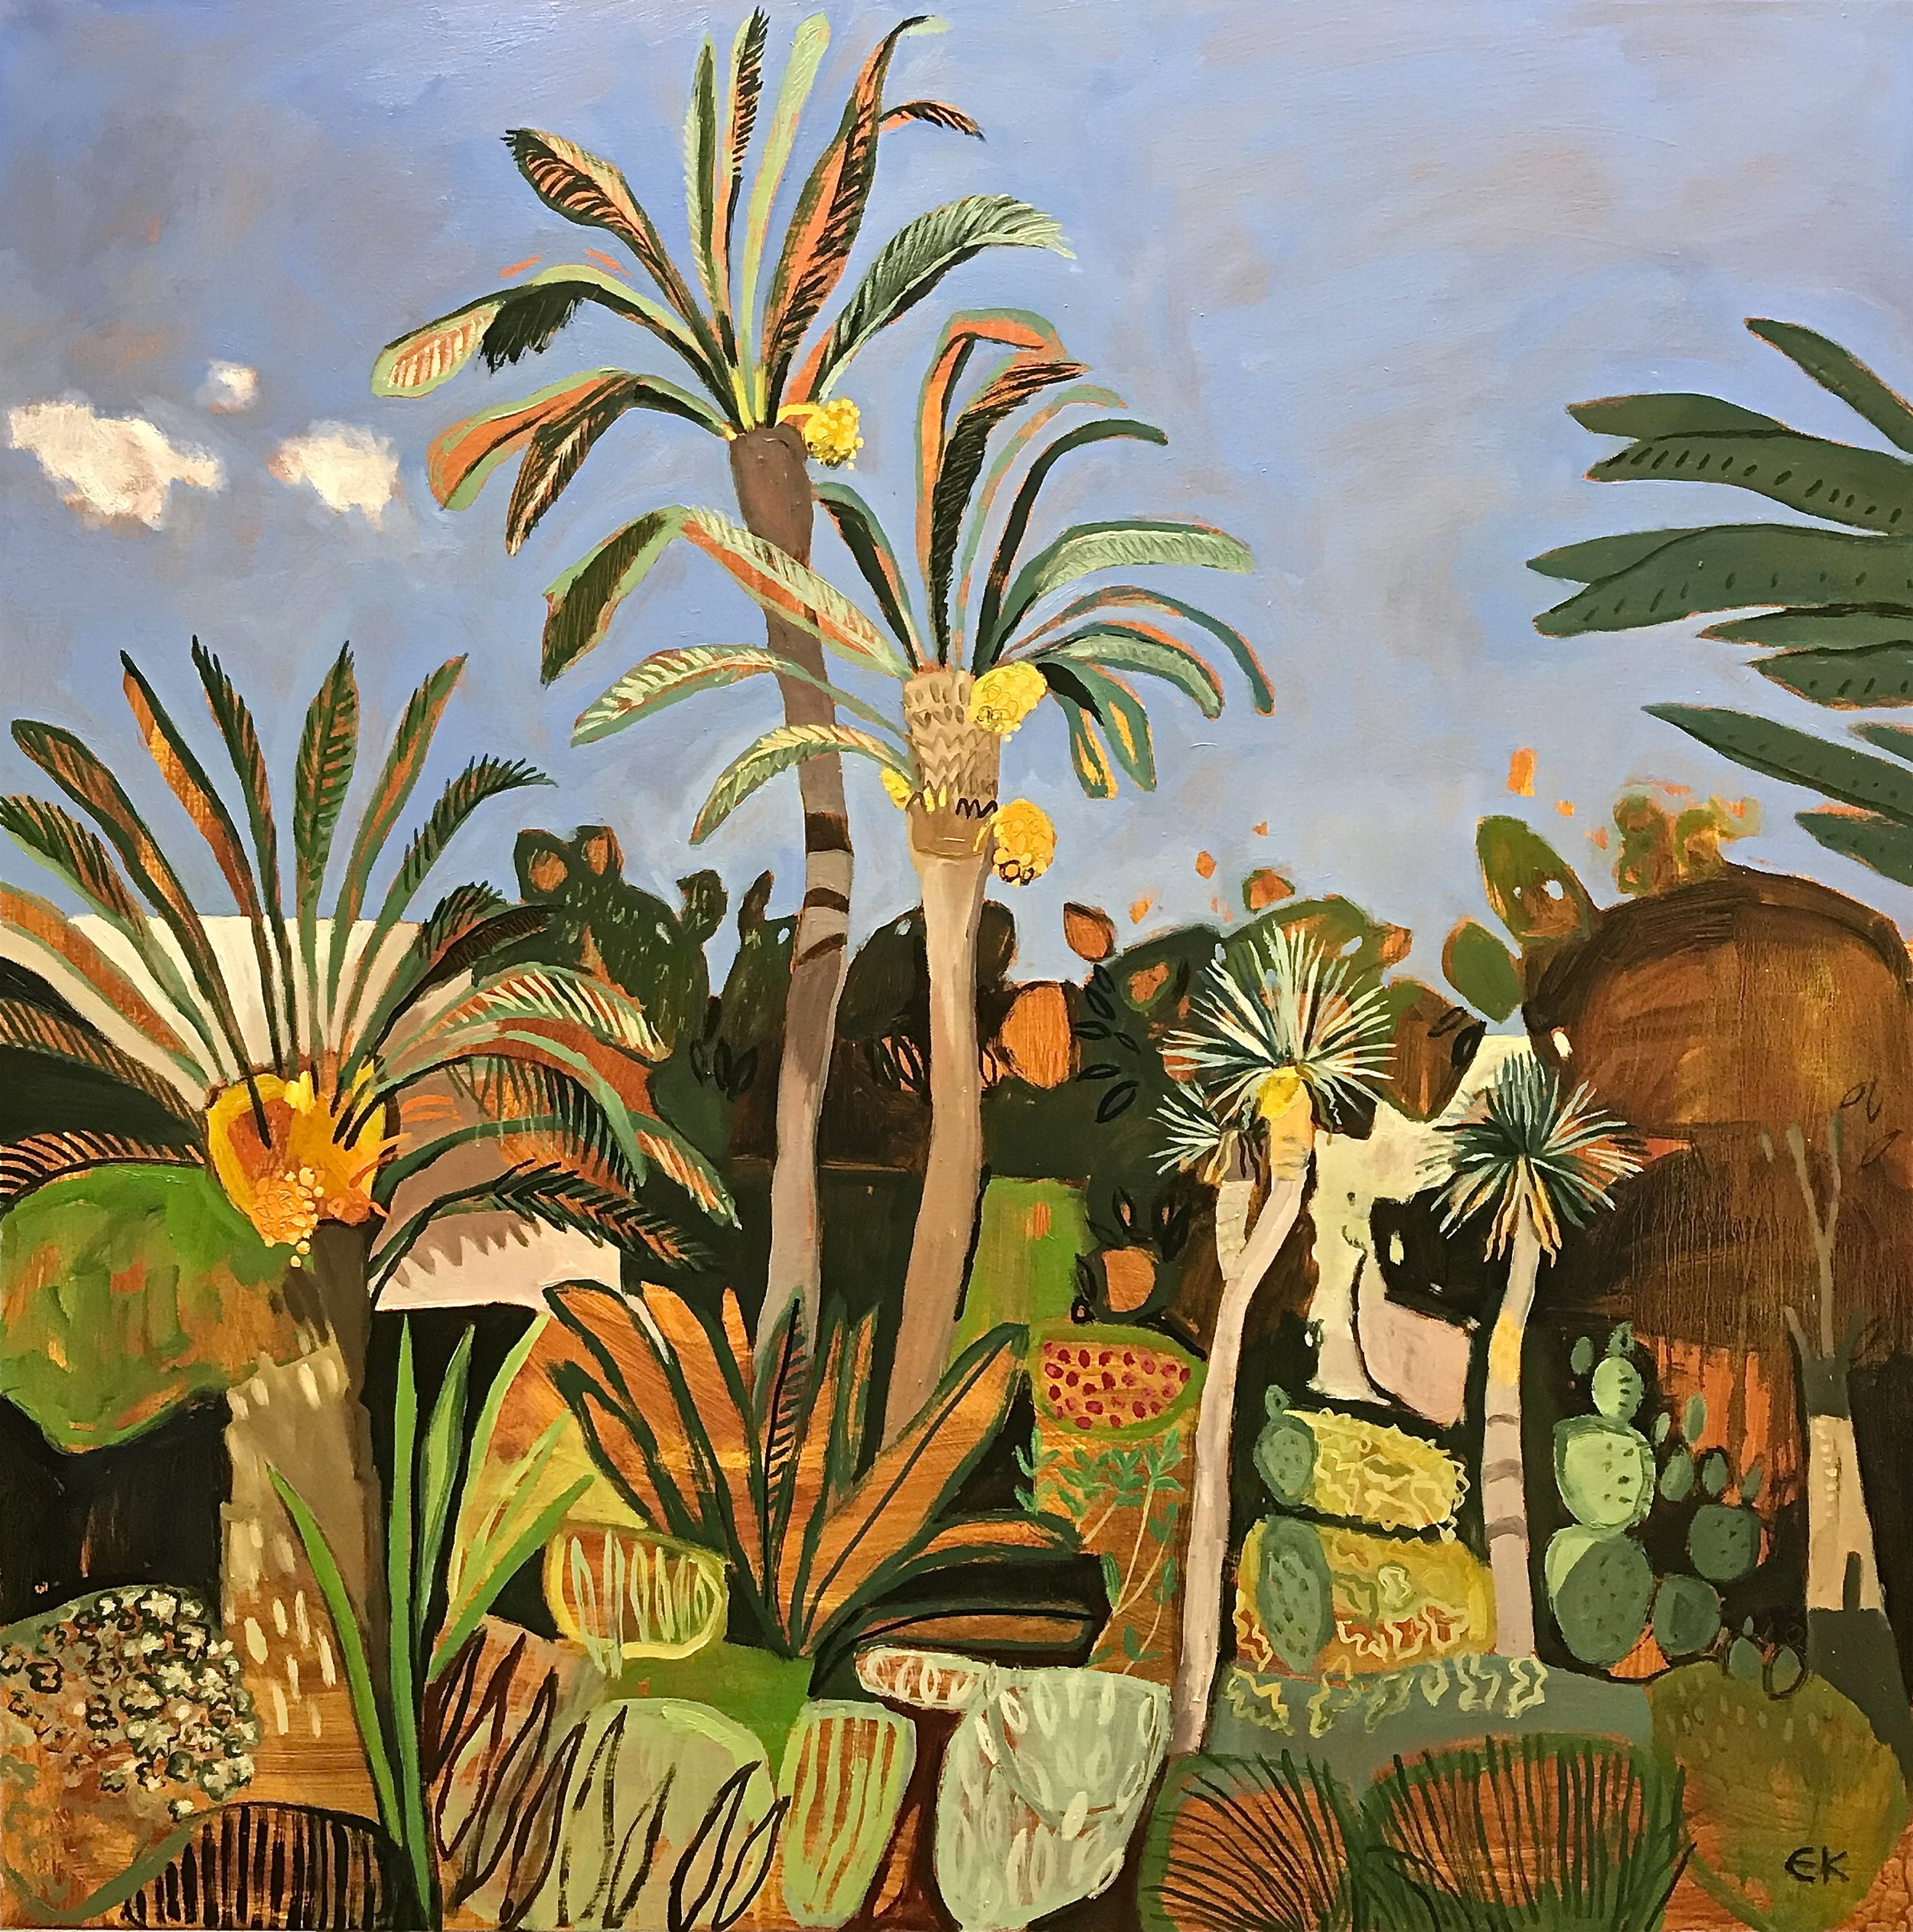 Le Jardin Secret with Date Palms, Marrakech